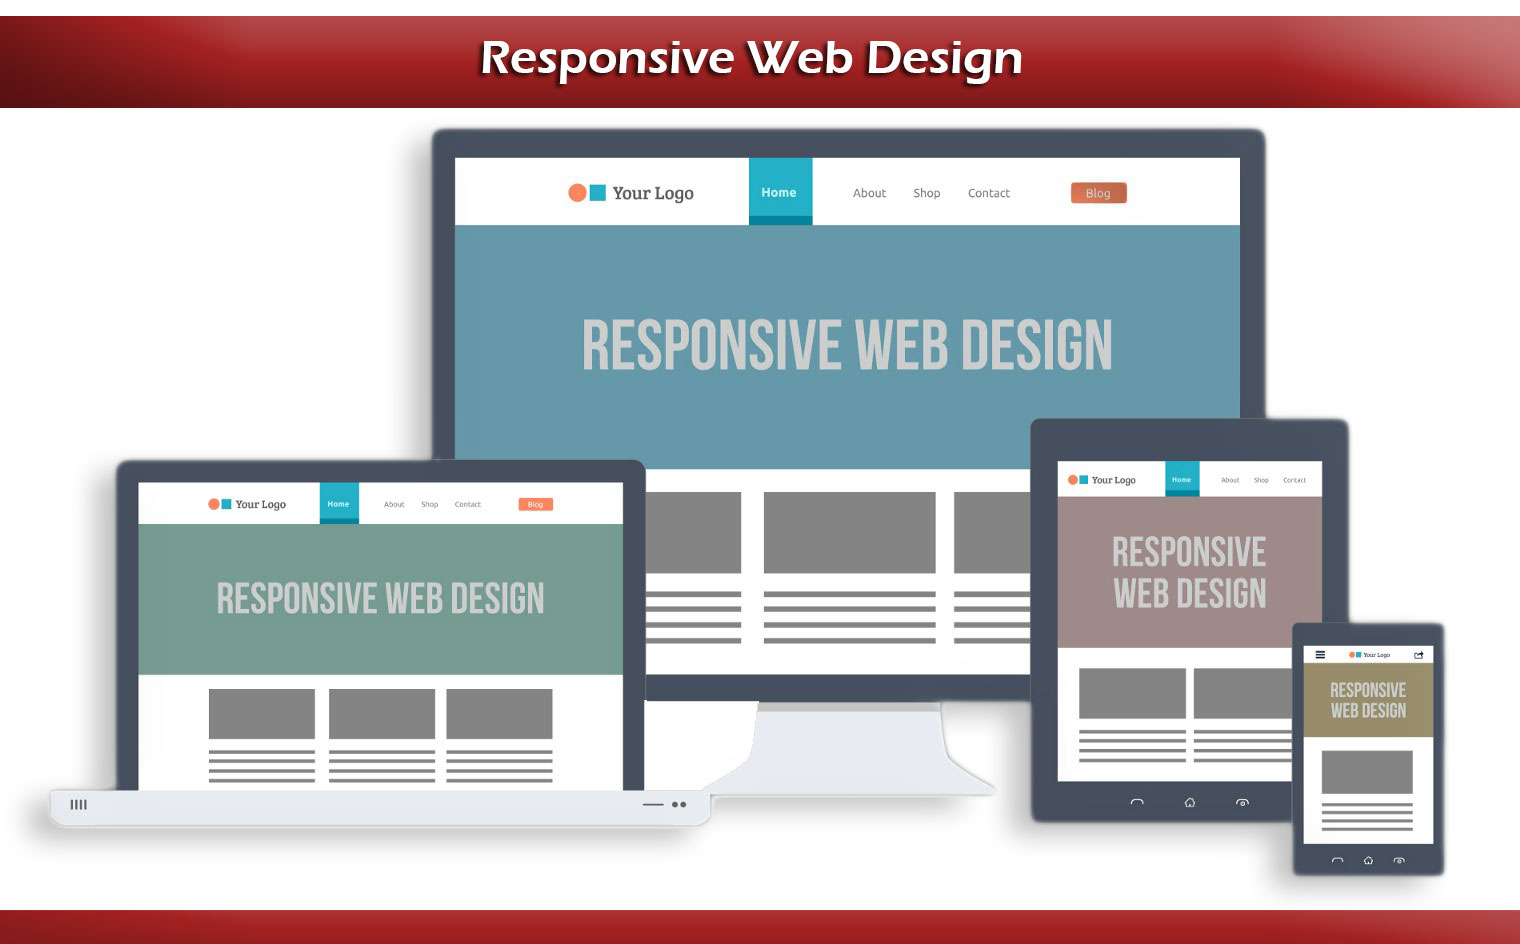 Responsivve Web Design